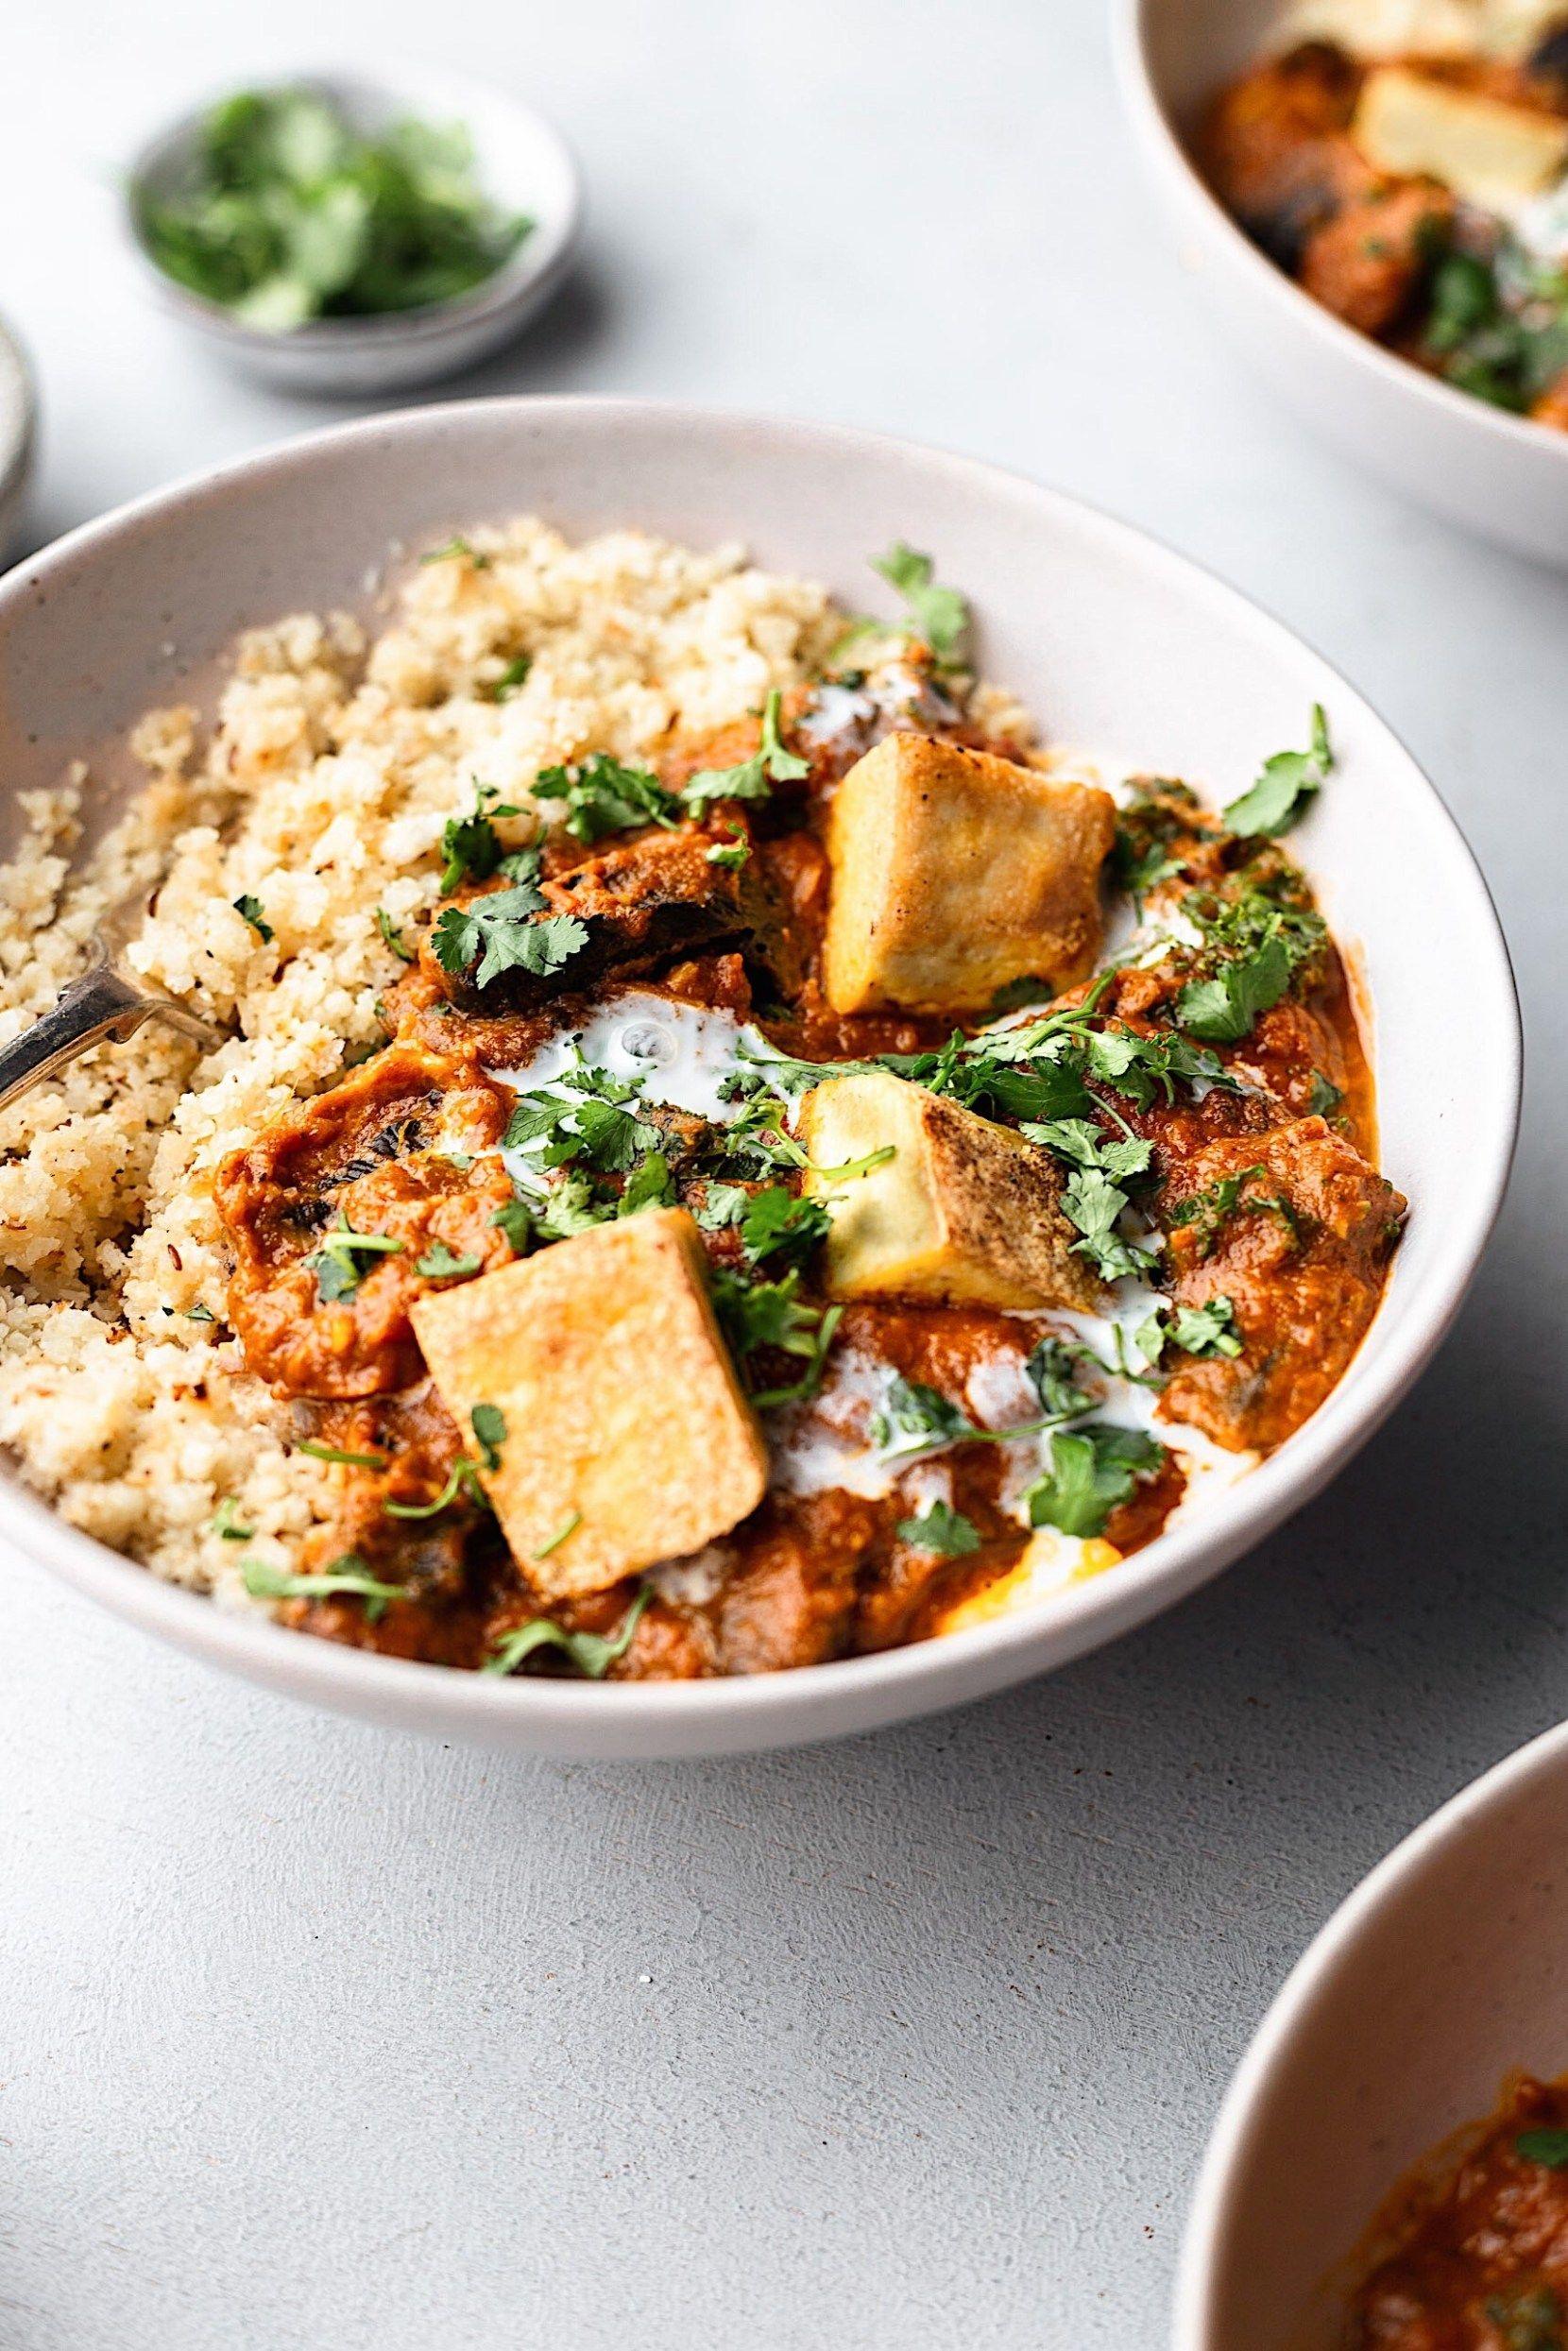 Mushroom And Tofu Tikka Masala With Cauliflower Rice